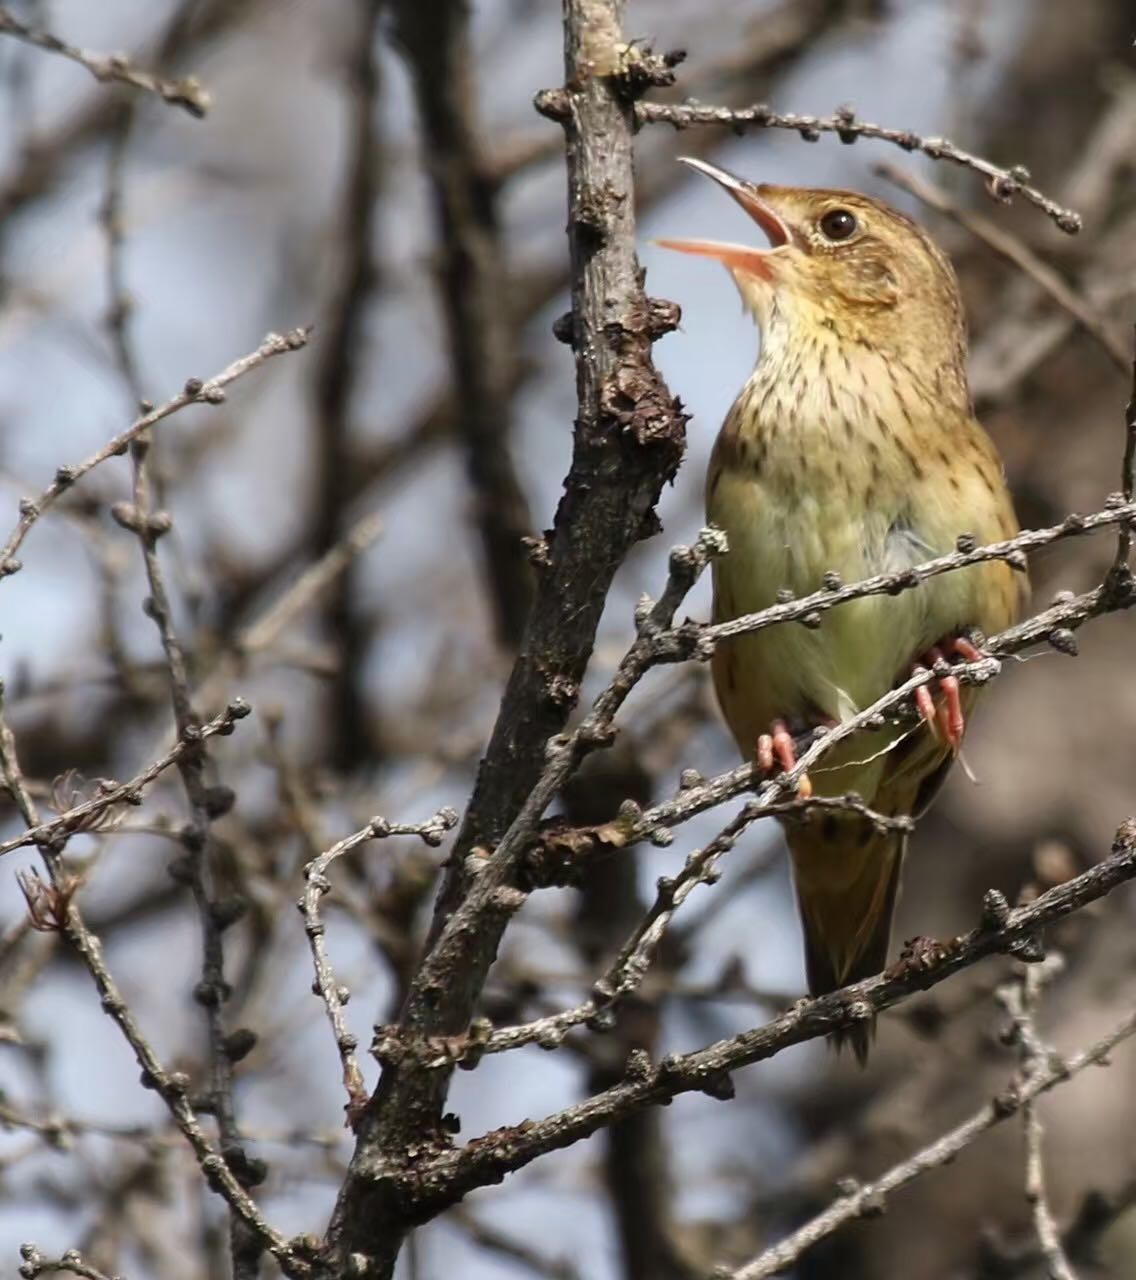 2016-07-09 Lanceolated Warbler, Wuerqihan